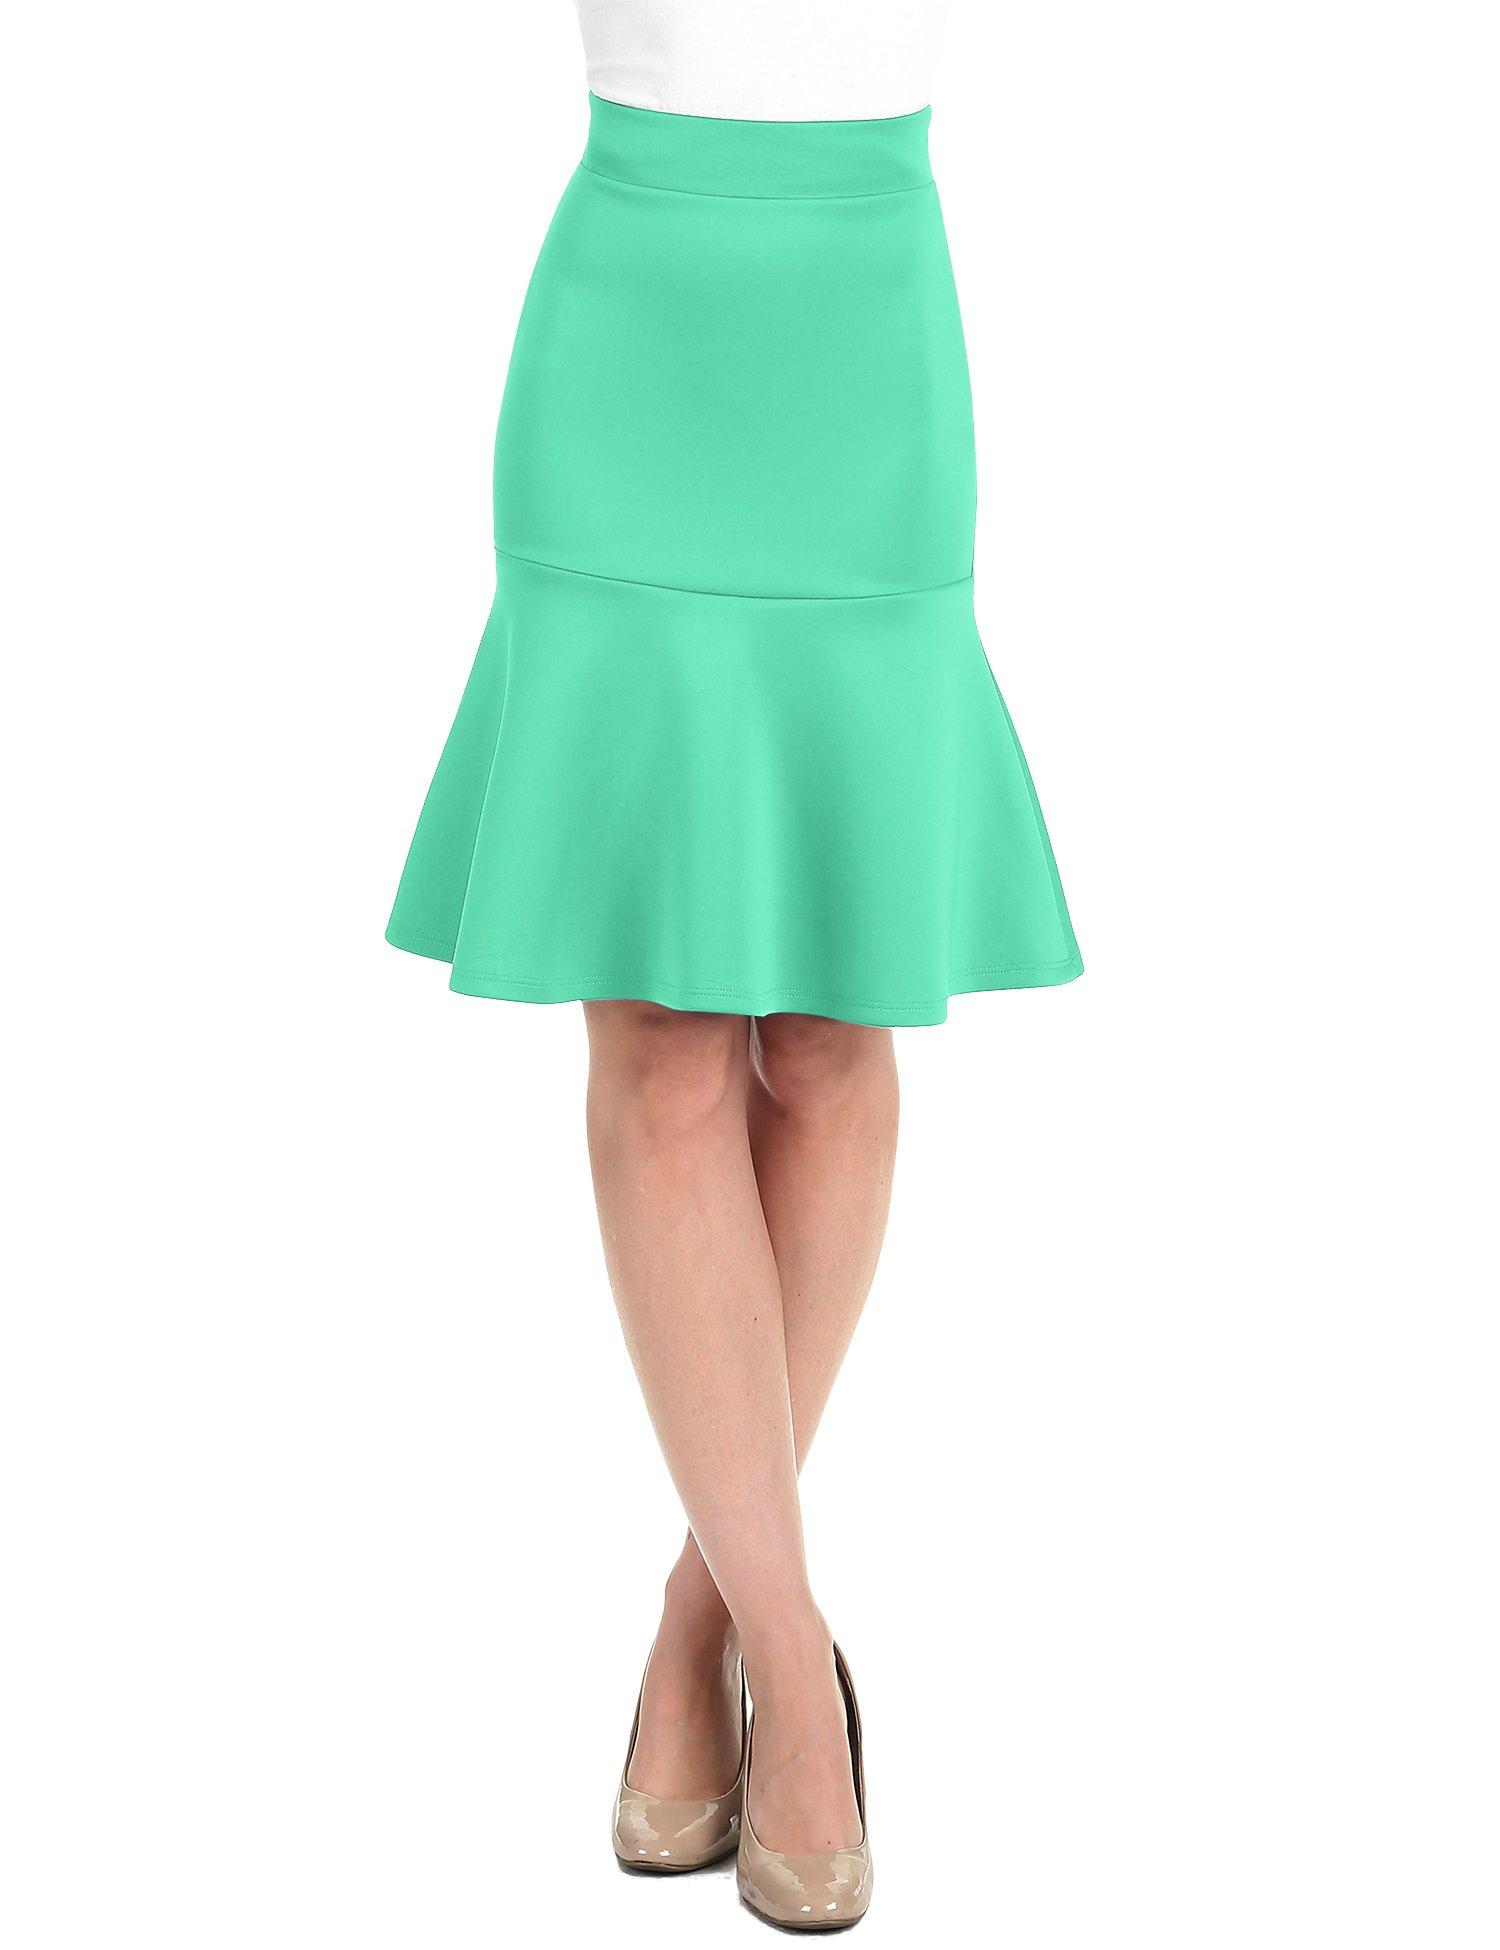 WT1471 Womens High Waist Bodycon Fishtail Midi Skirt XXL Kelly_Green